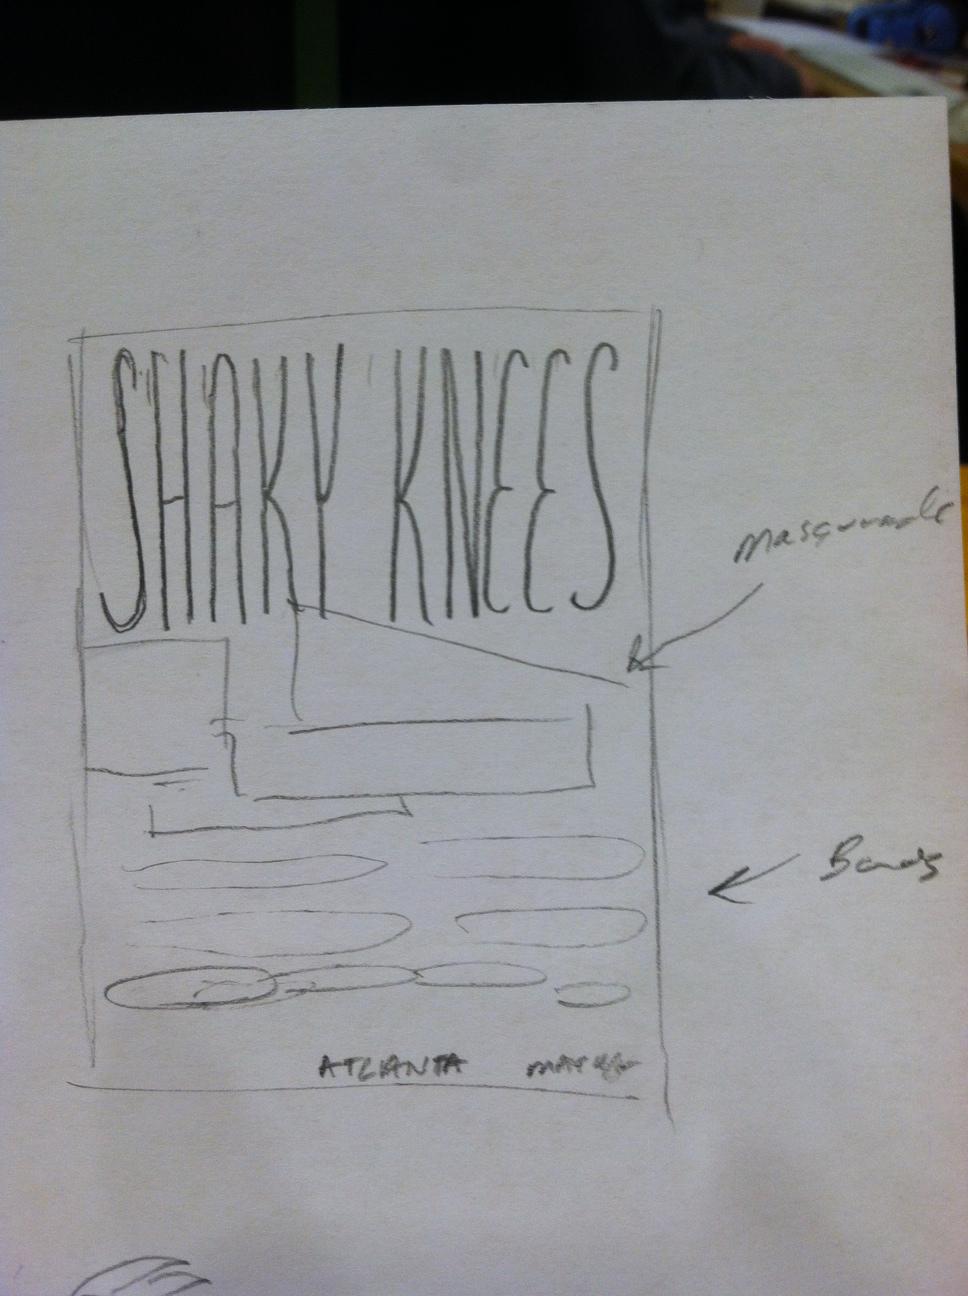 Shaky Knees Festival - Atlanta, GA - image 3 - student project